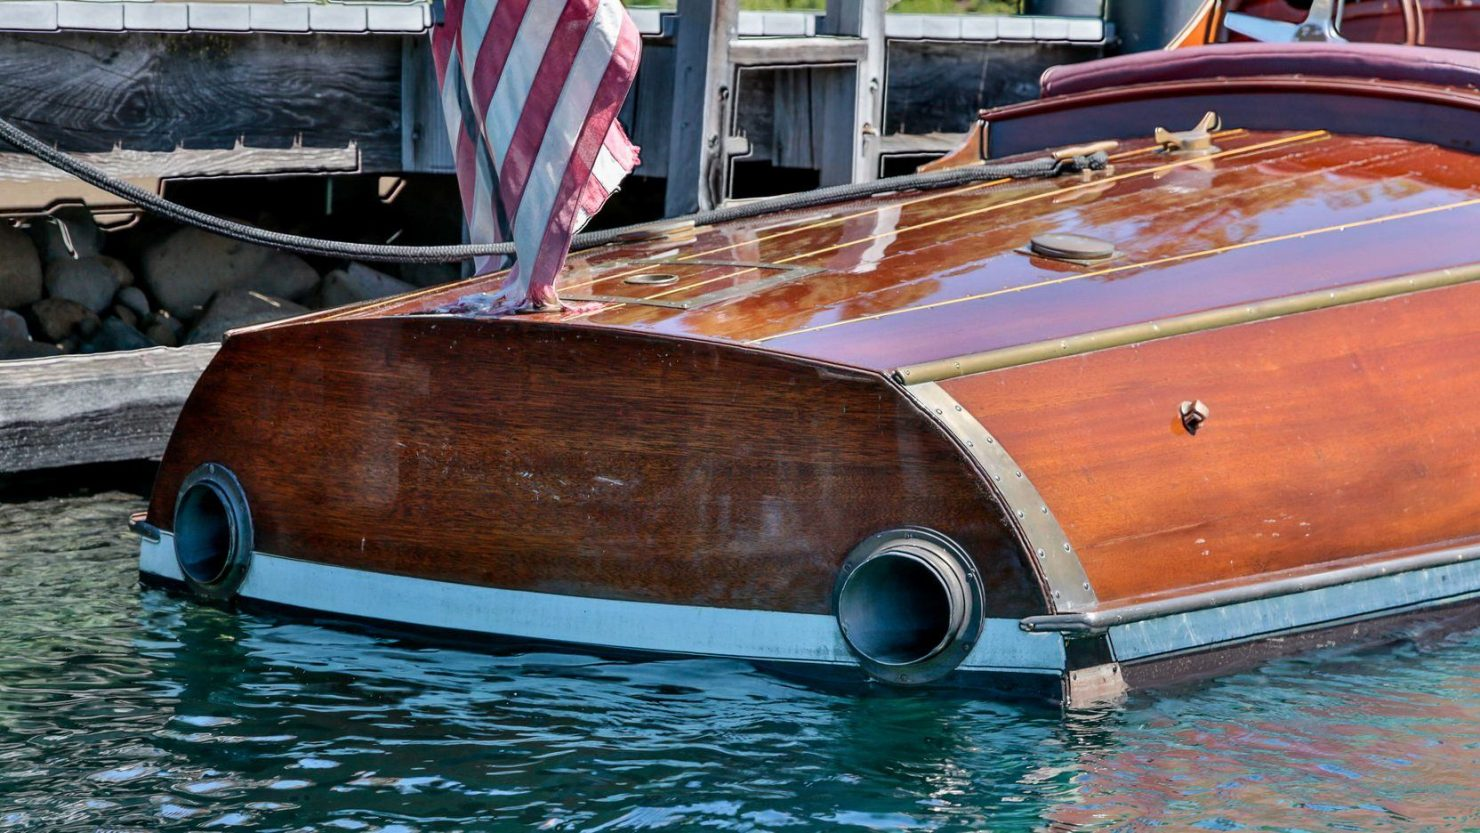 mahogany speed boat 1 1480x833 - 27 Liter V12 Brown & Bassett Gentleman's Racer